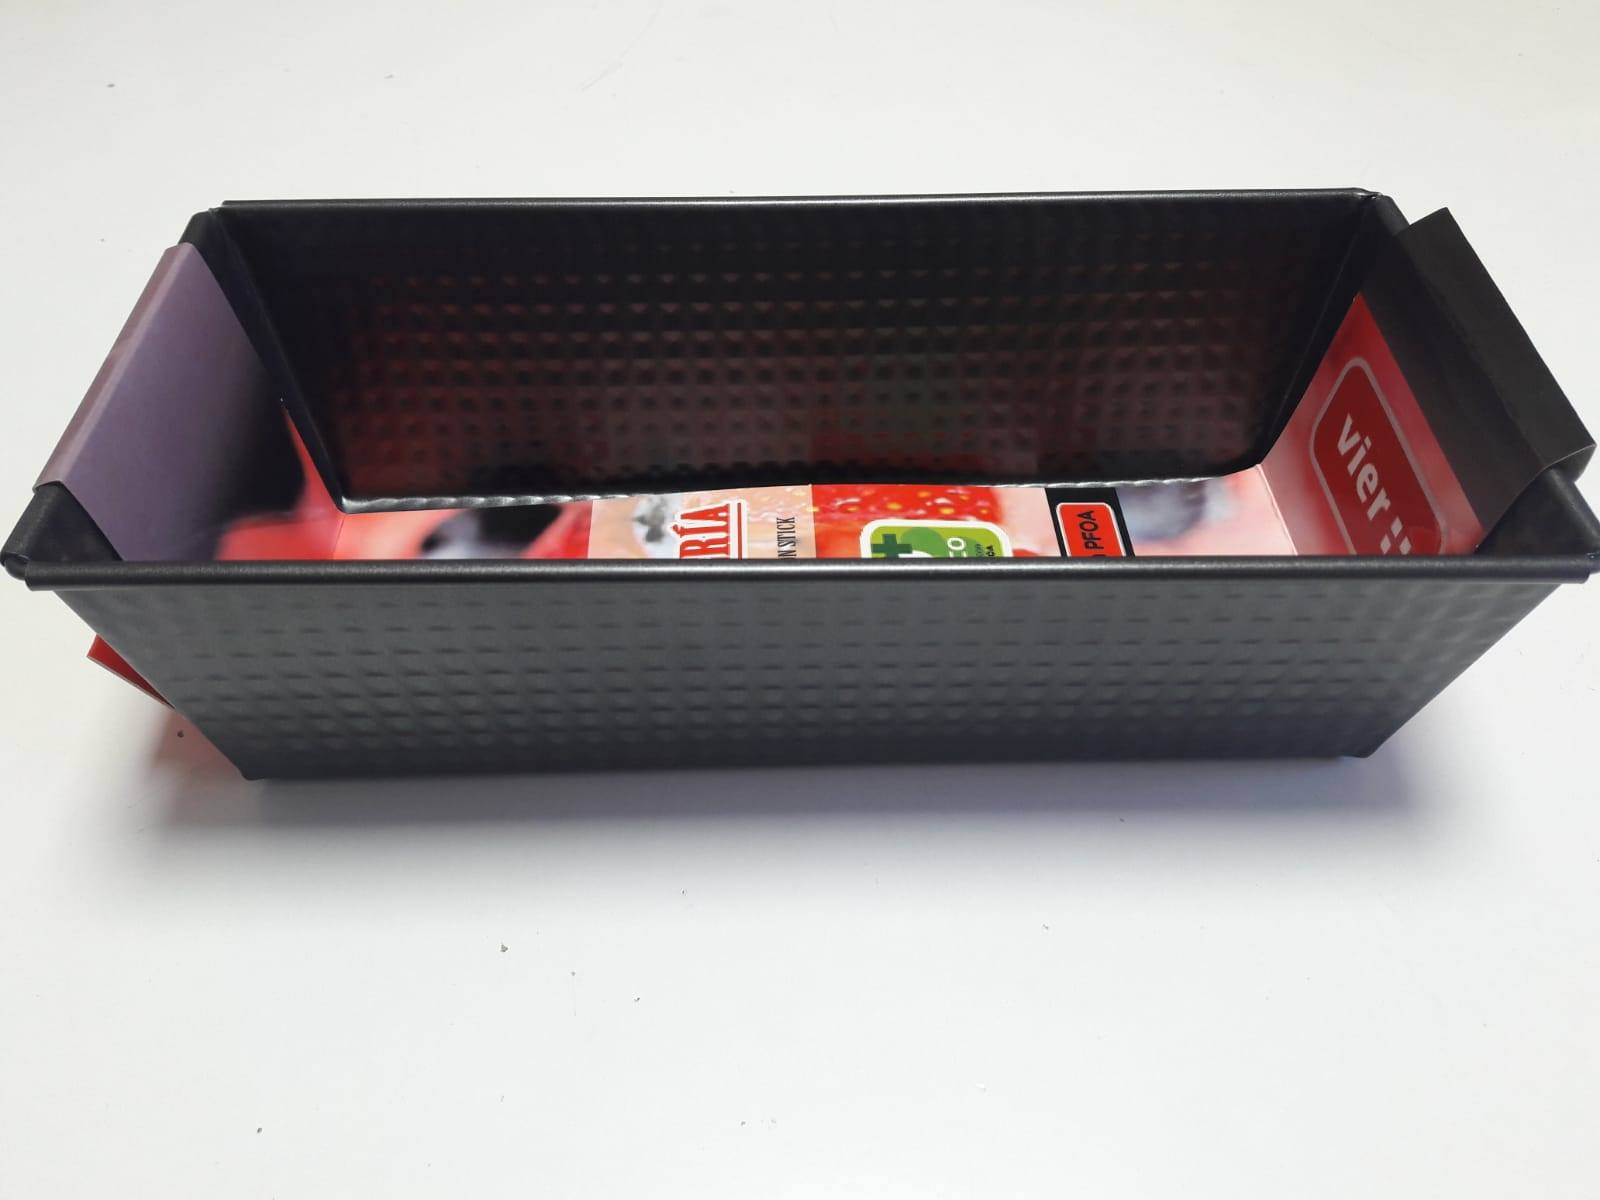 Oferta Molde bizcocho antiadherente vier 21x12x8